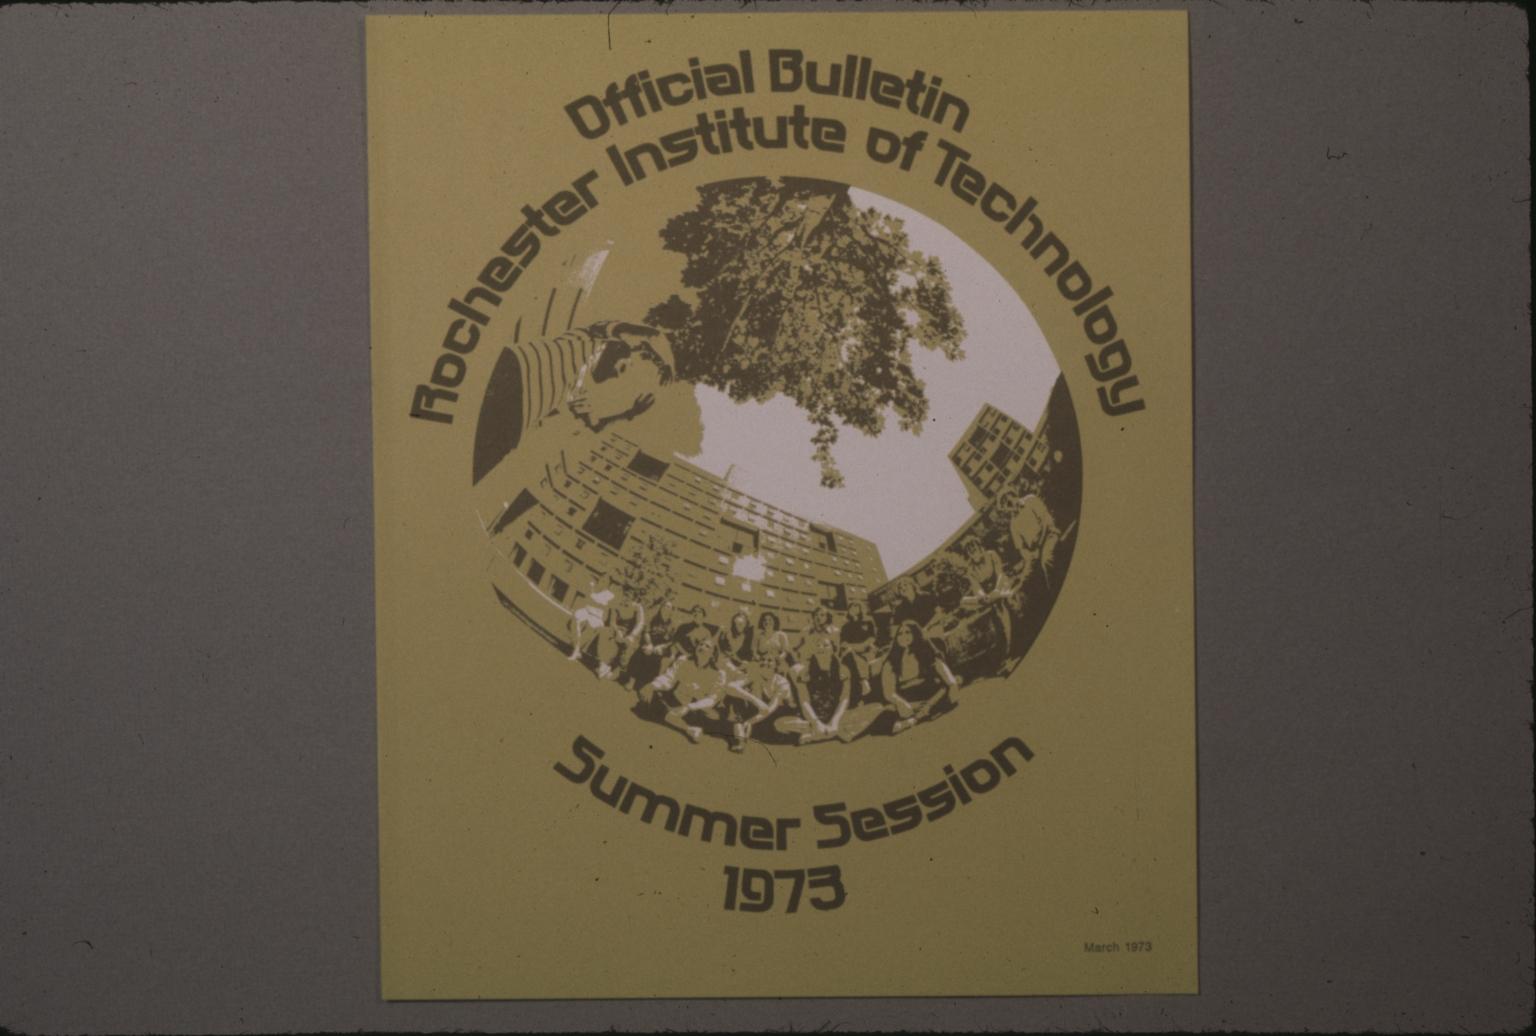 Summer Session Bulletin cover